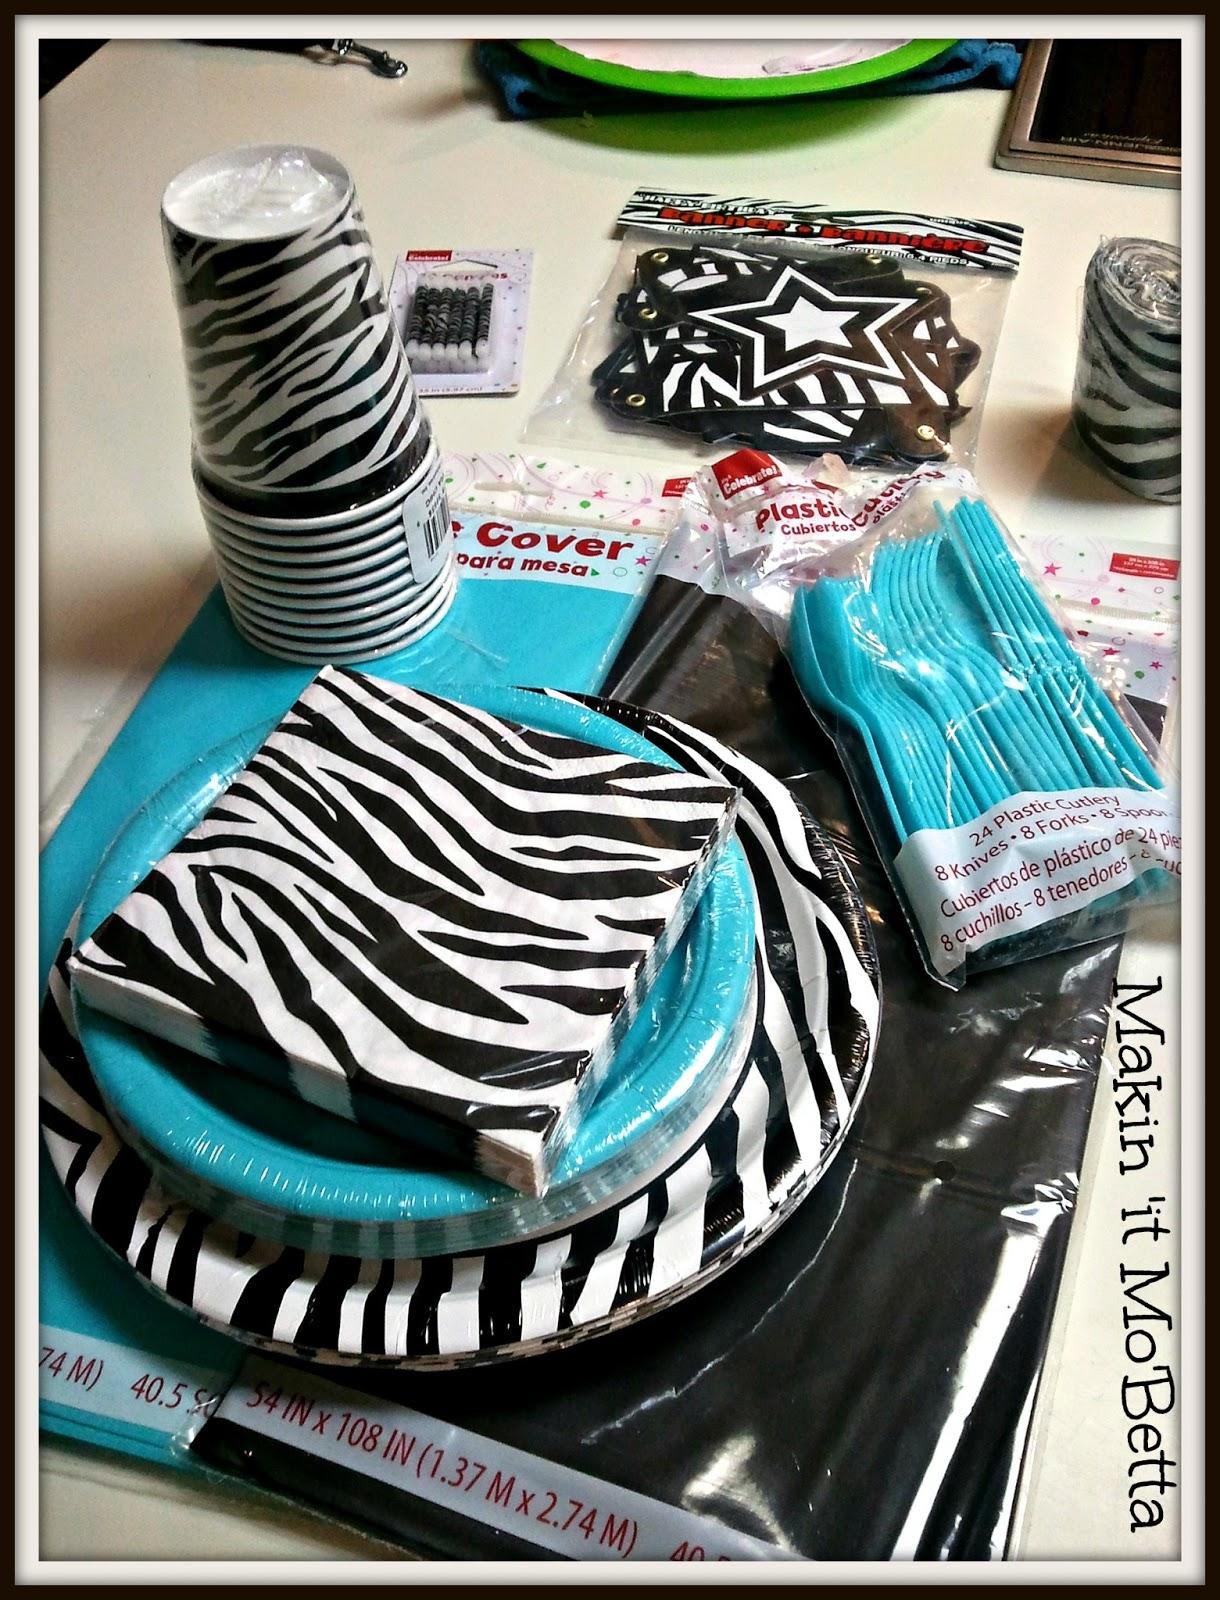 Blue Zebra Birthday Party Theme Image Inspiration of Cake and